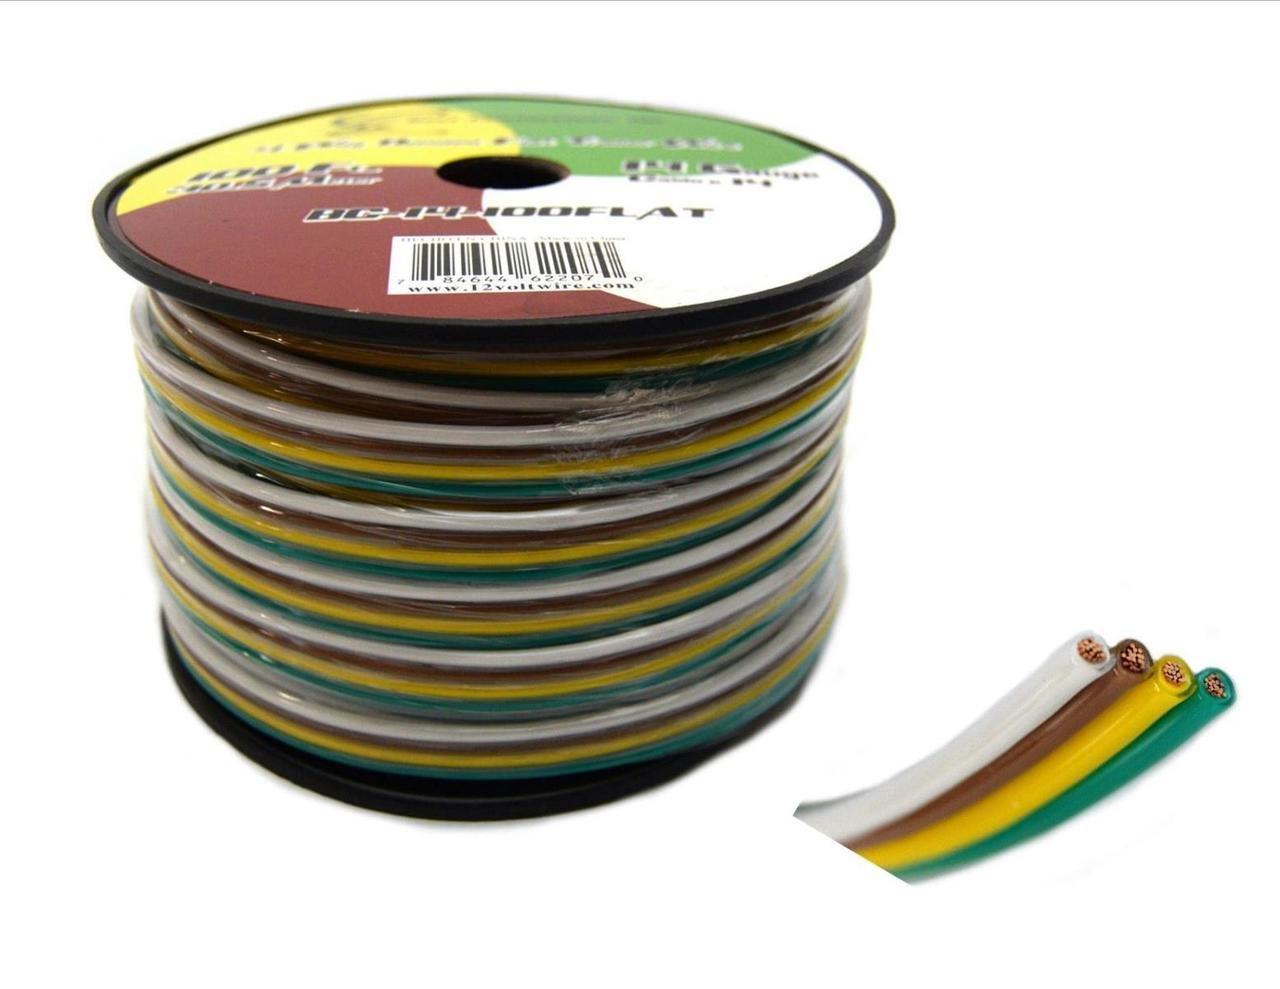 trailer wire kit amazon com rh amazon com 6 Way Ignition Switch 6 Way Trailer Lights